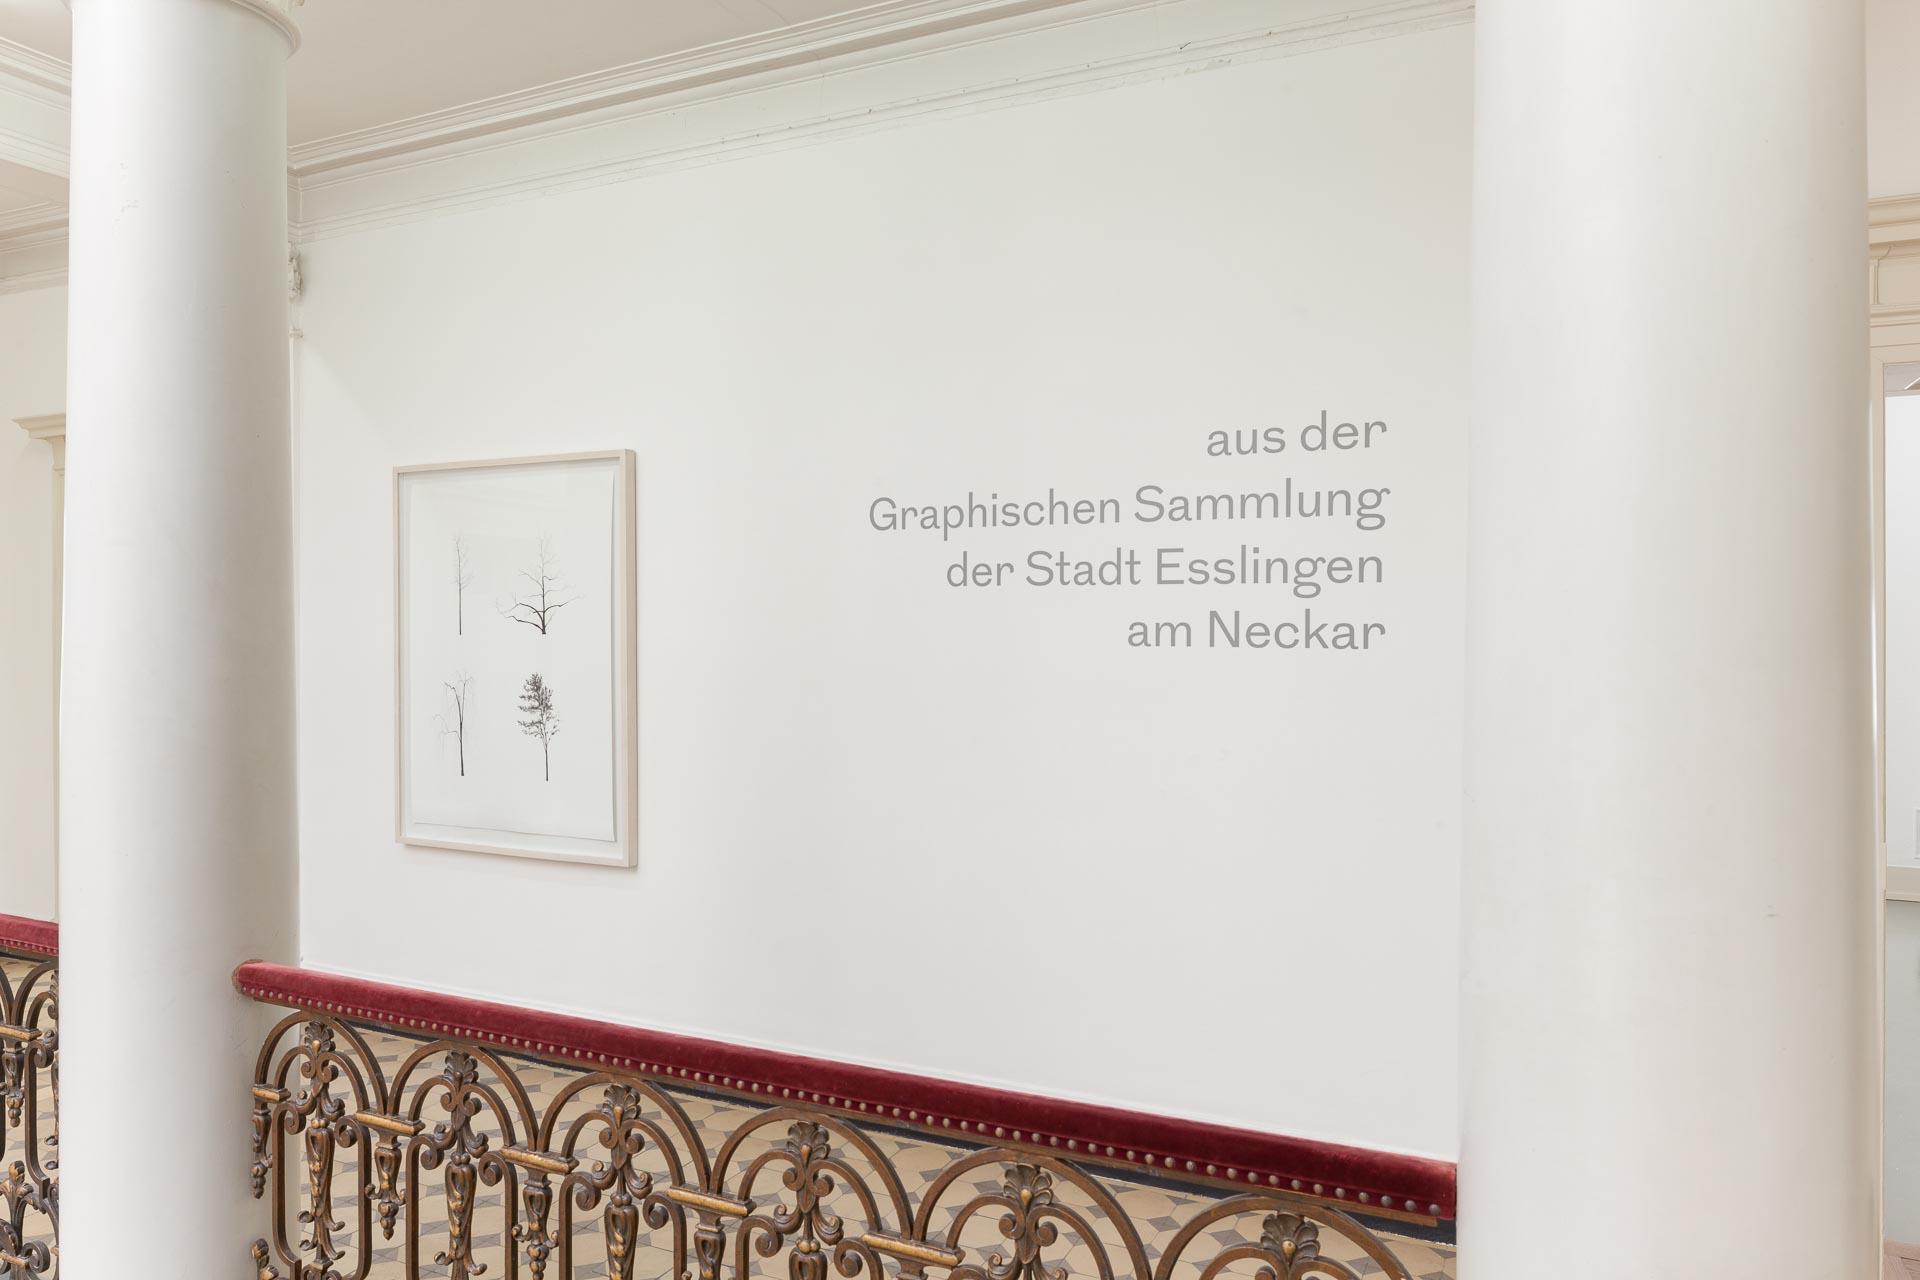 Museumsfotografie Villa Merkel, Graphische Sammlung